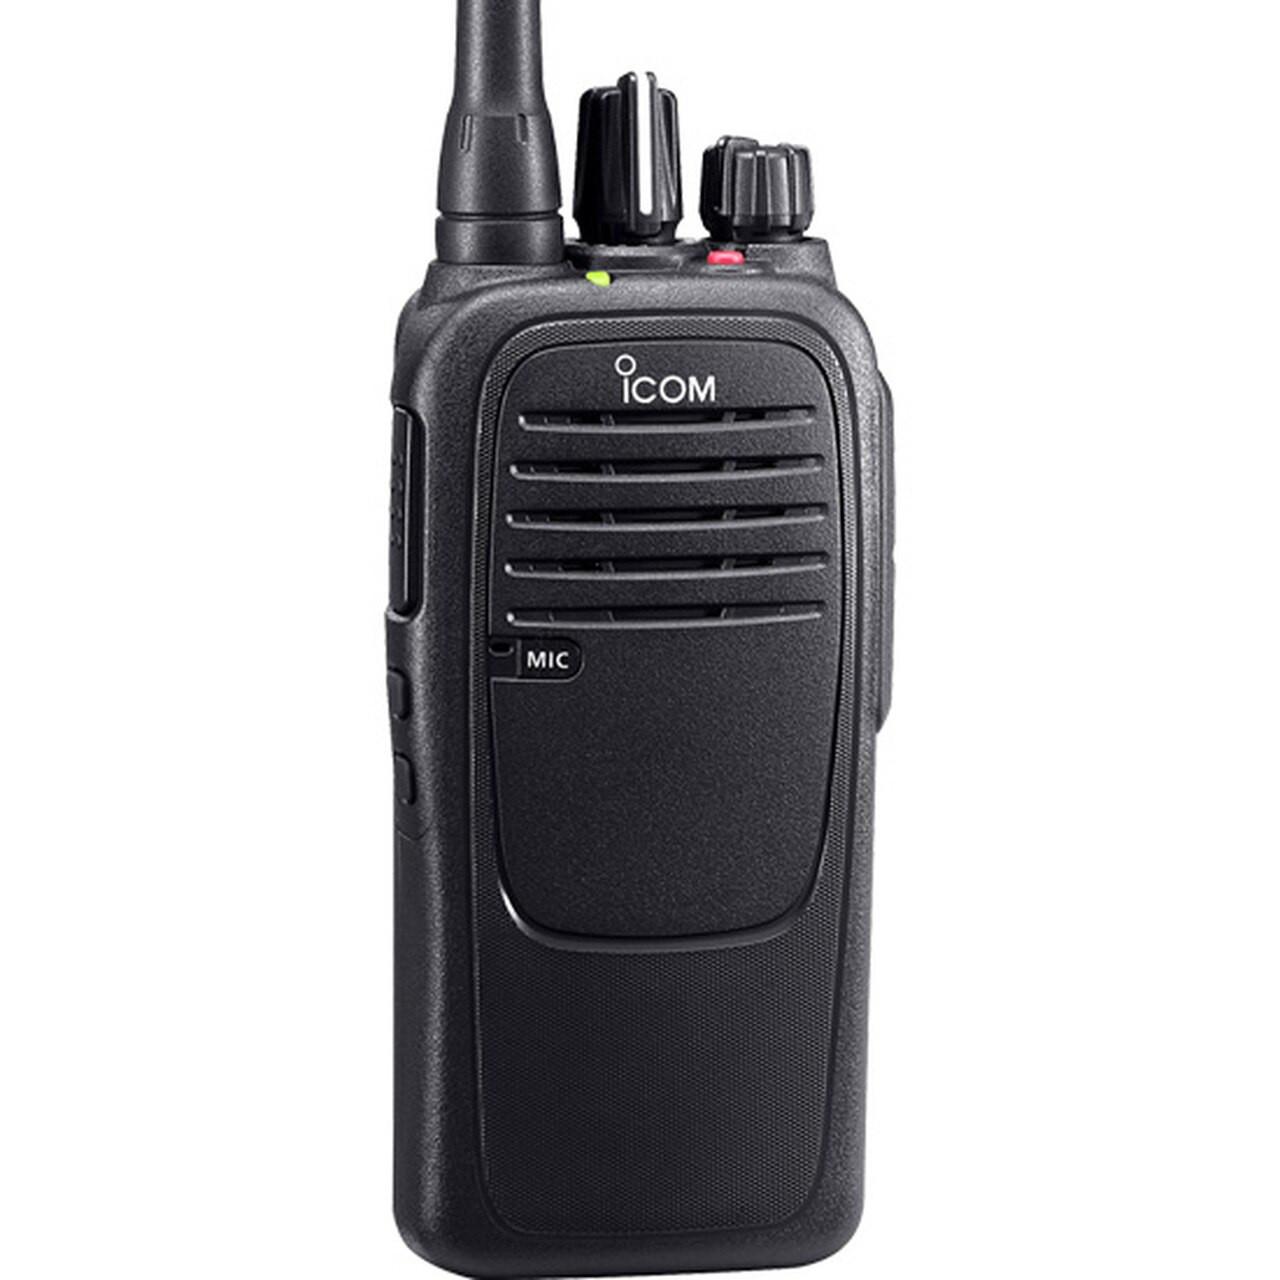 ICOM F2001 4 Watt Waterproof Two Way Radio